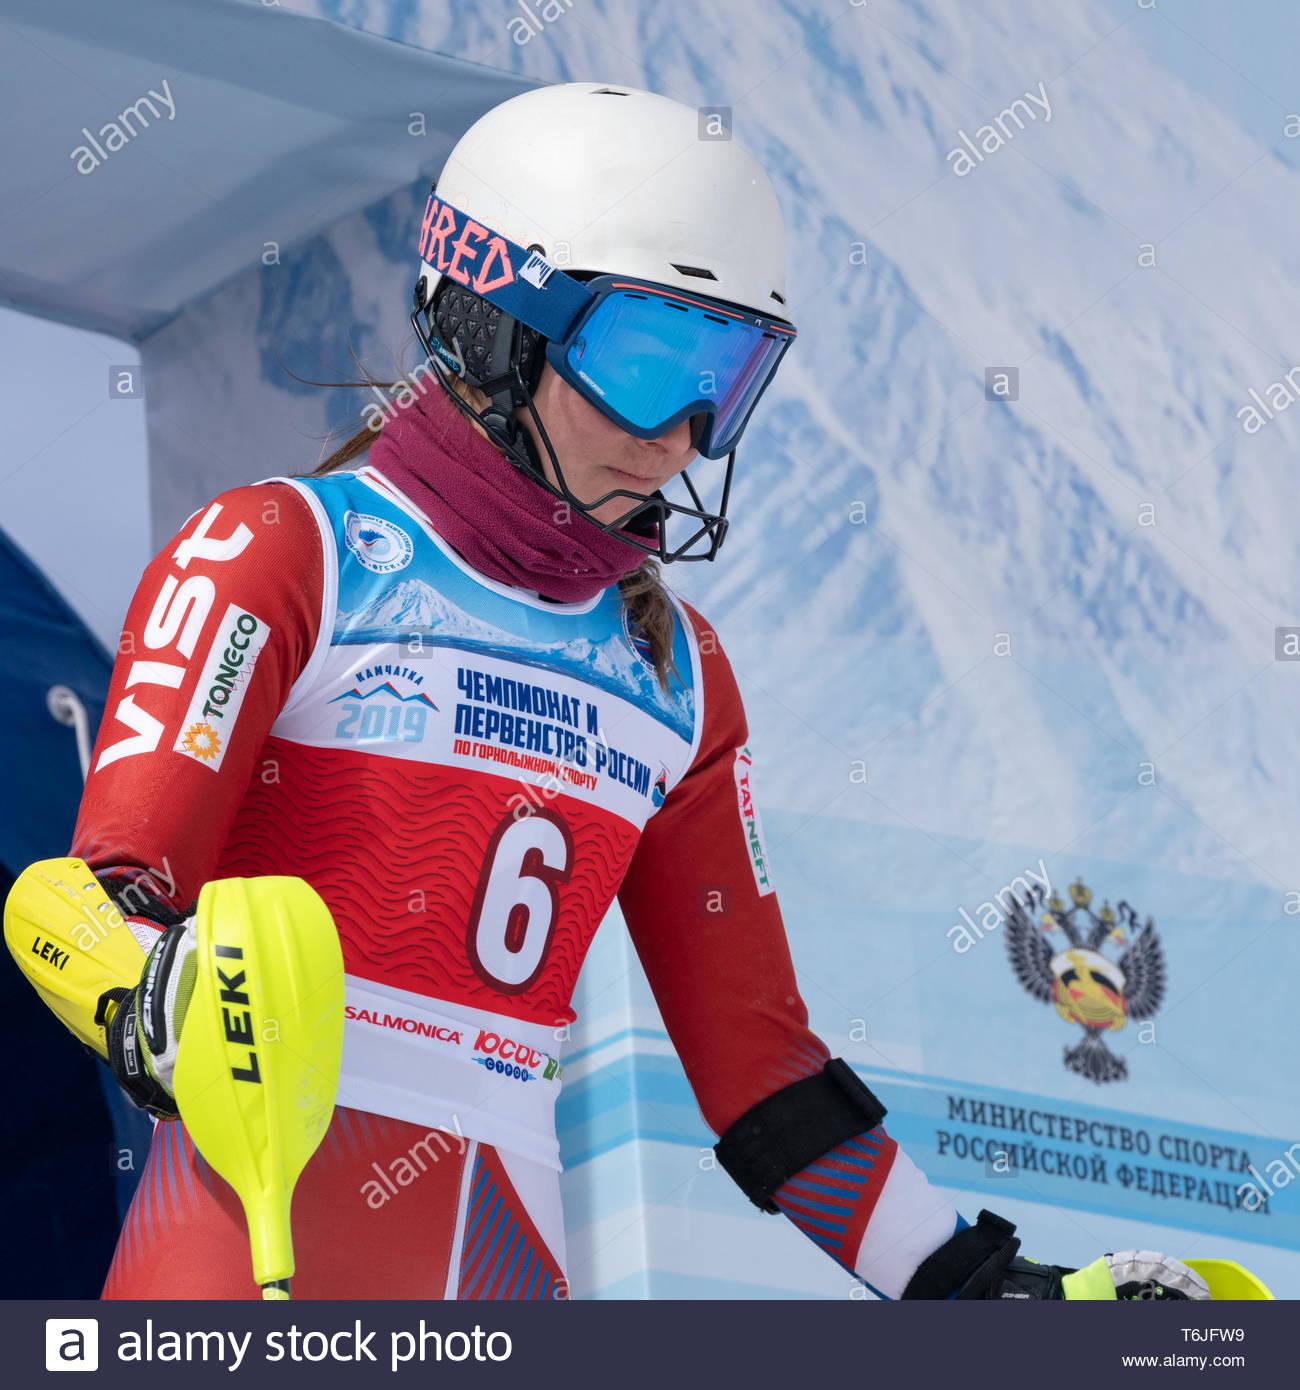 MOROZNAYA MOUNTAIN, KAMCHATKA PENINSULA, RUSSIA - MAR 29, 2019: Russian Alpine Skiing Championship, International Ski Federation Championship, slalom. - Stock Image